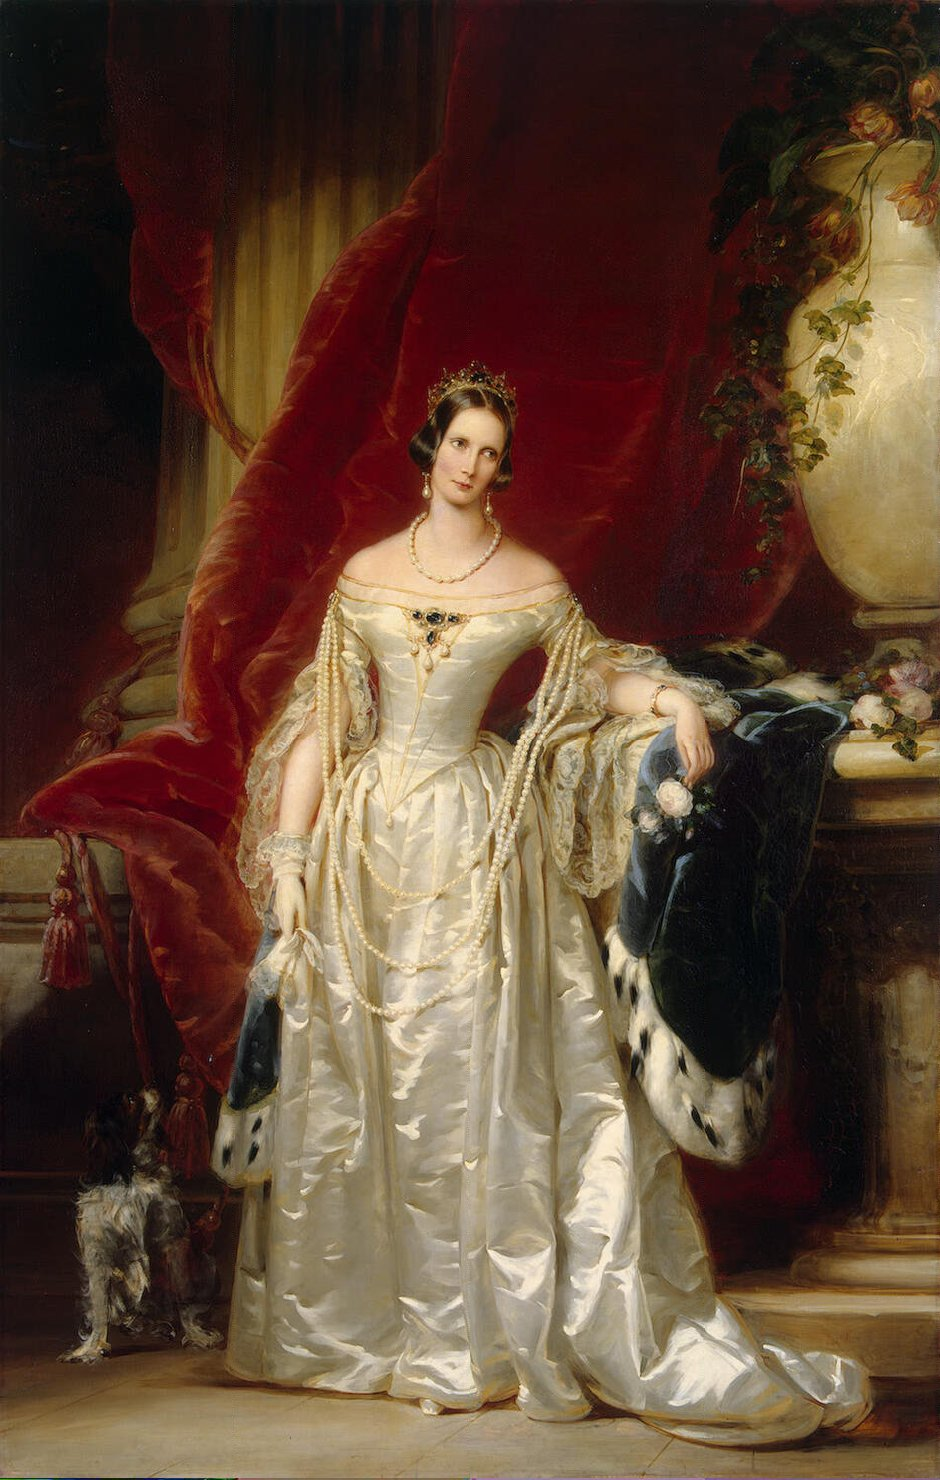 Victorian British Painting: Christina Robertson